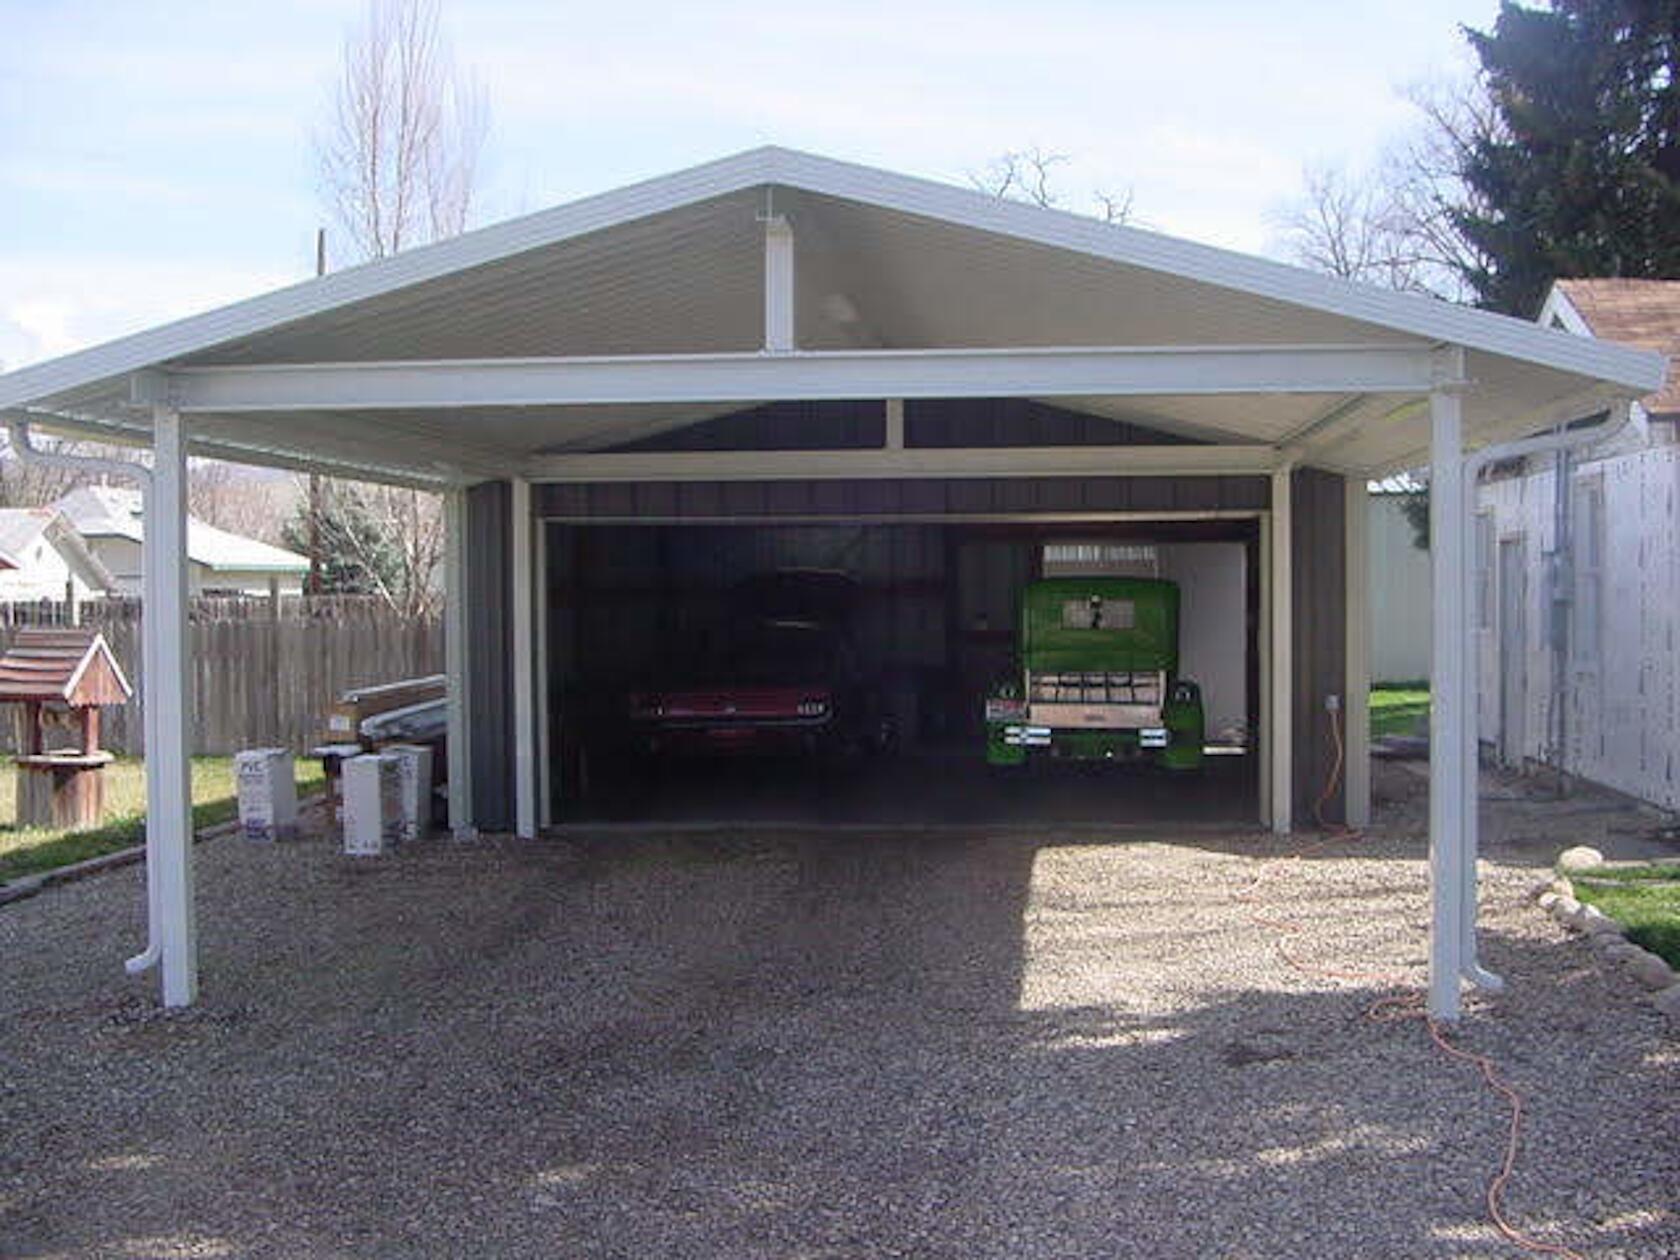 Pin by Gretchen Duggan on Garage in 2020 Carport designs